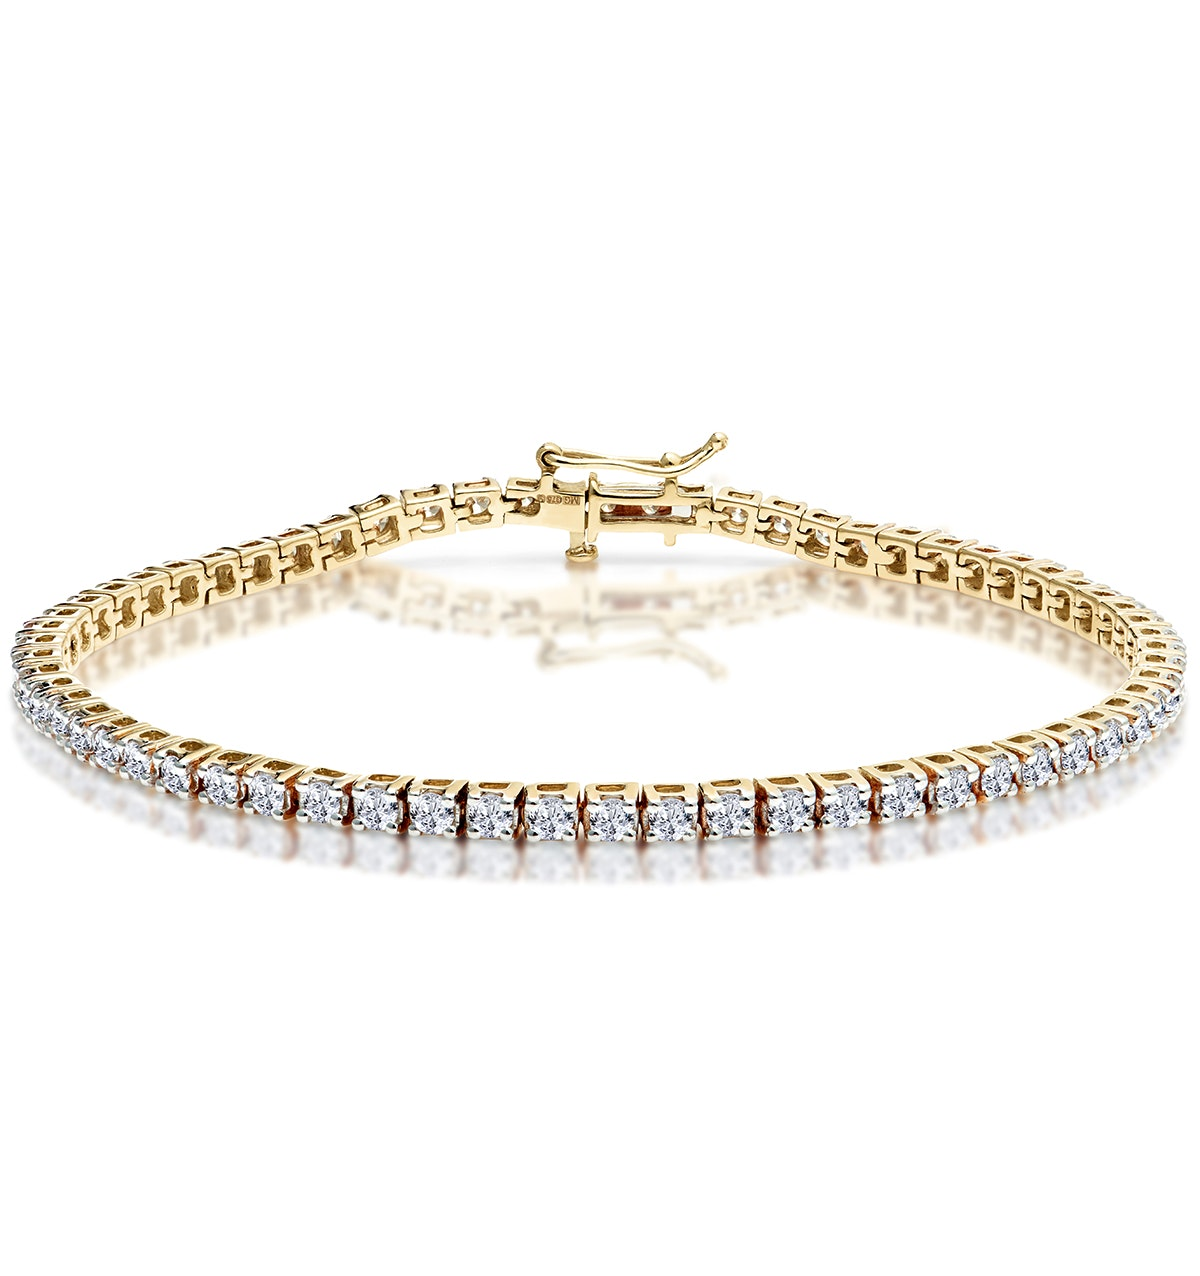 3ct Diamond Tennis Bracelet Claw Set in 9K Yellow Gold